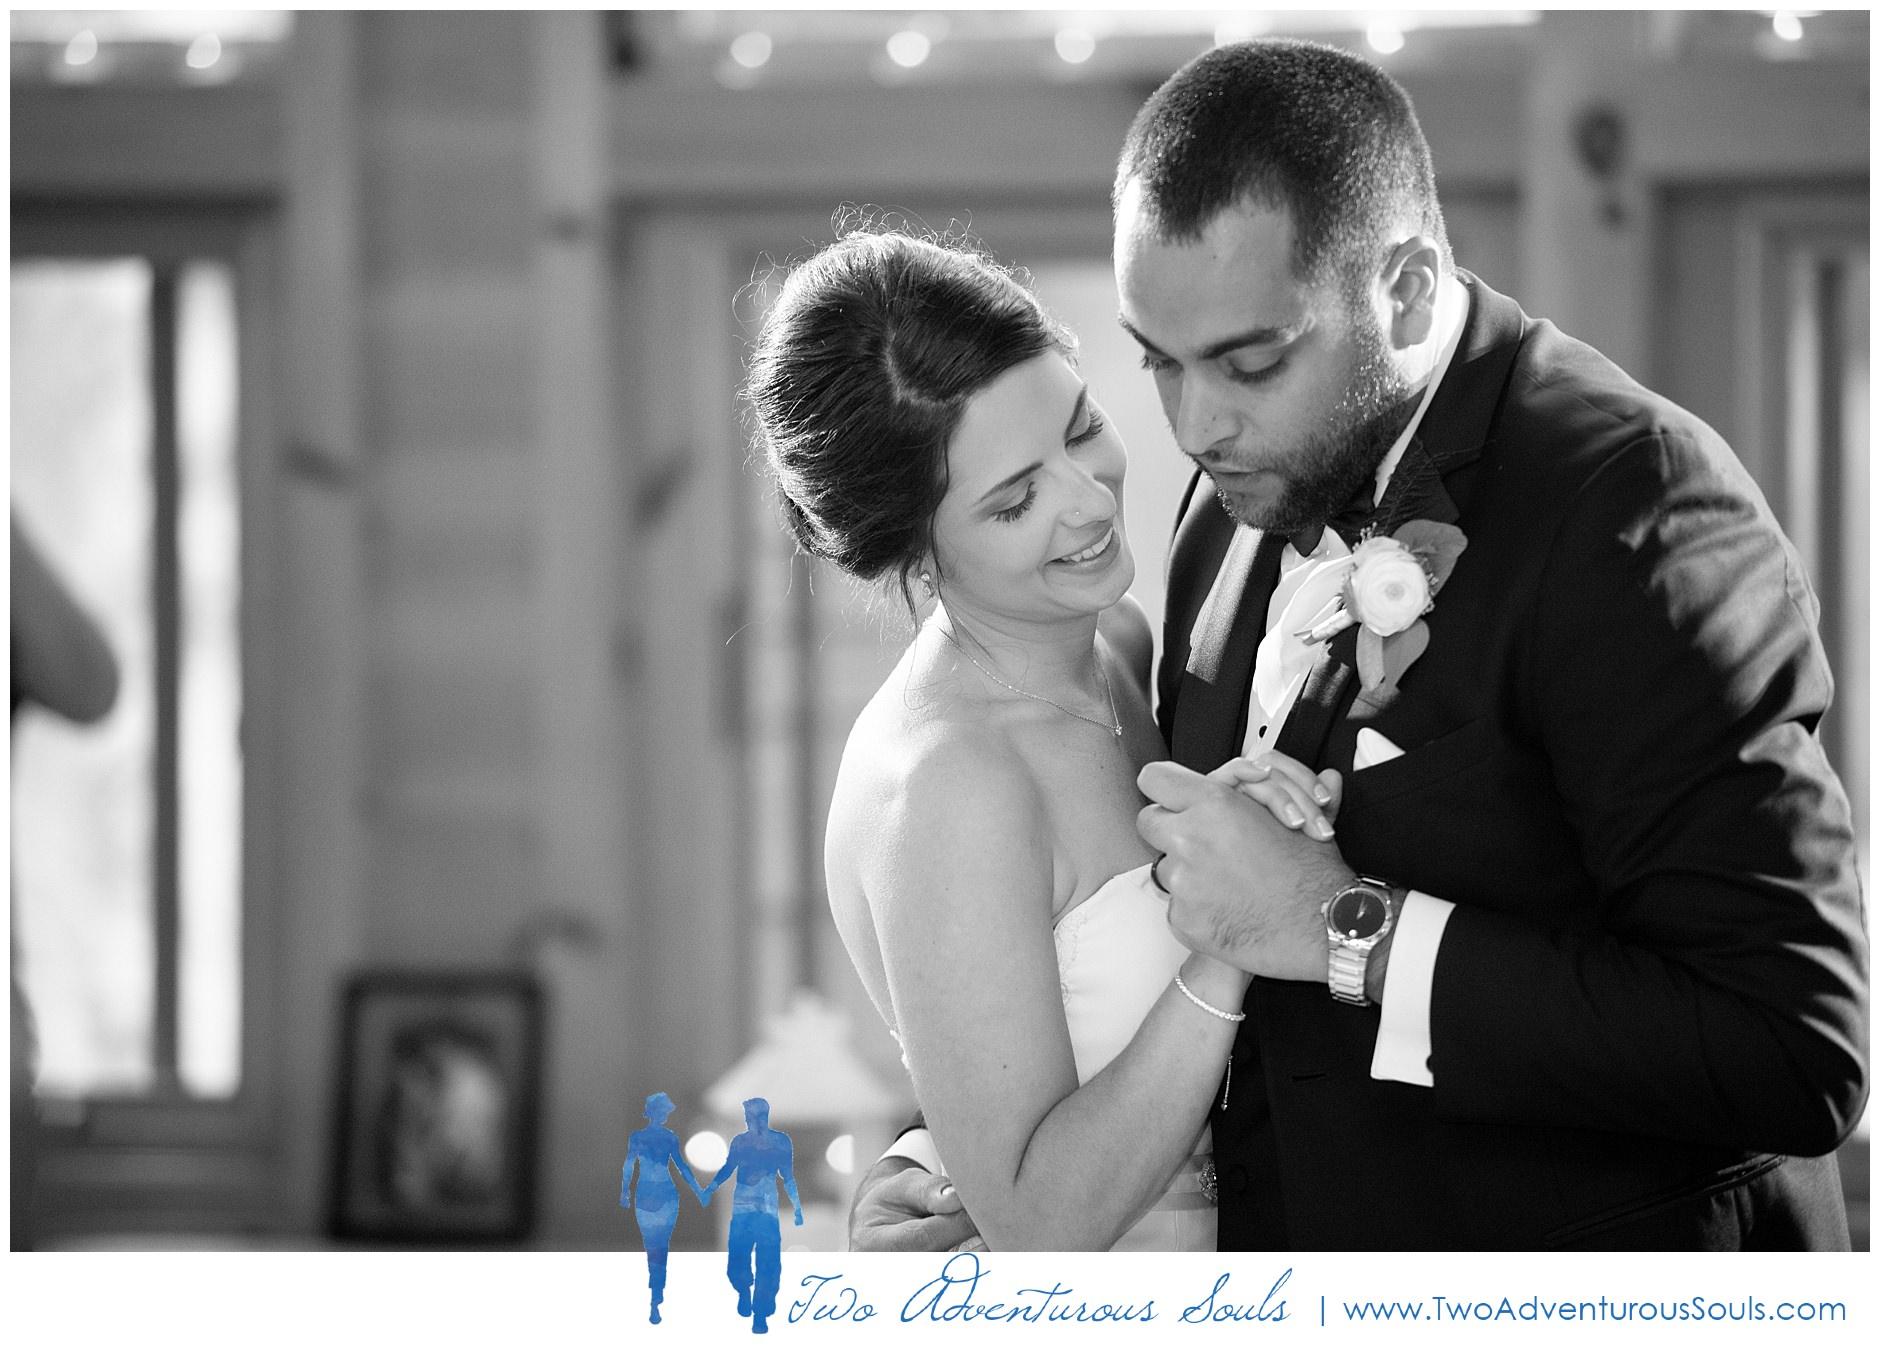 Sugarloaf Outdoor Center Wedding Photographers, Destination Wedding Photographers, Two Adventurous Souls-081719_0054.jpg